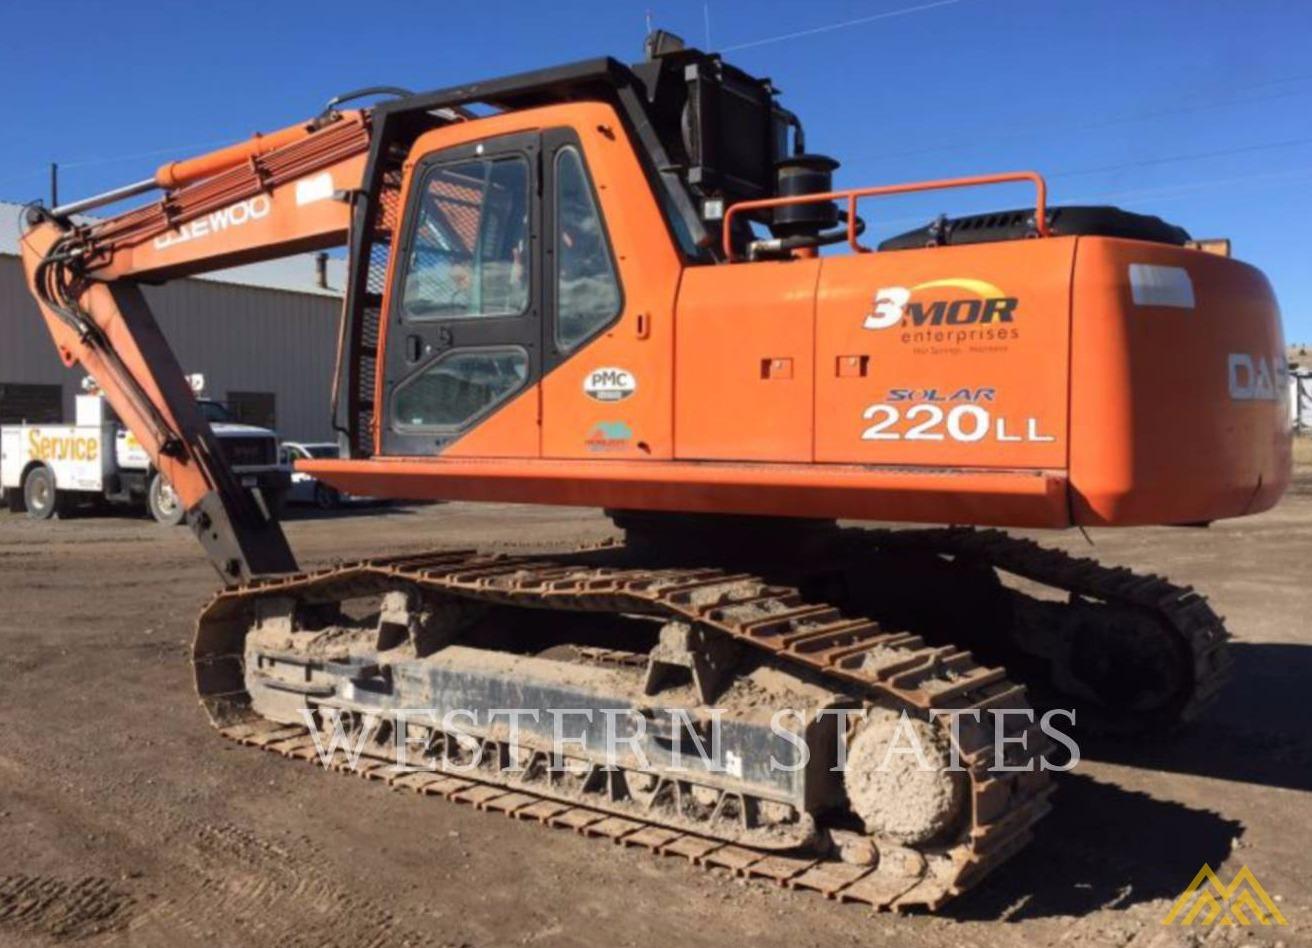 Daewoo Solar 220 LL Log Loader Excavator  2